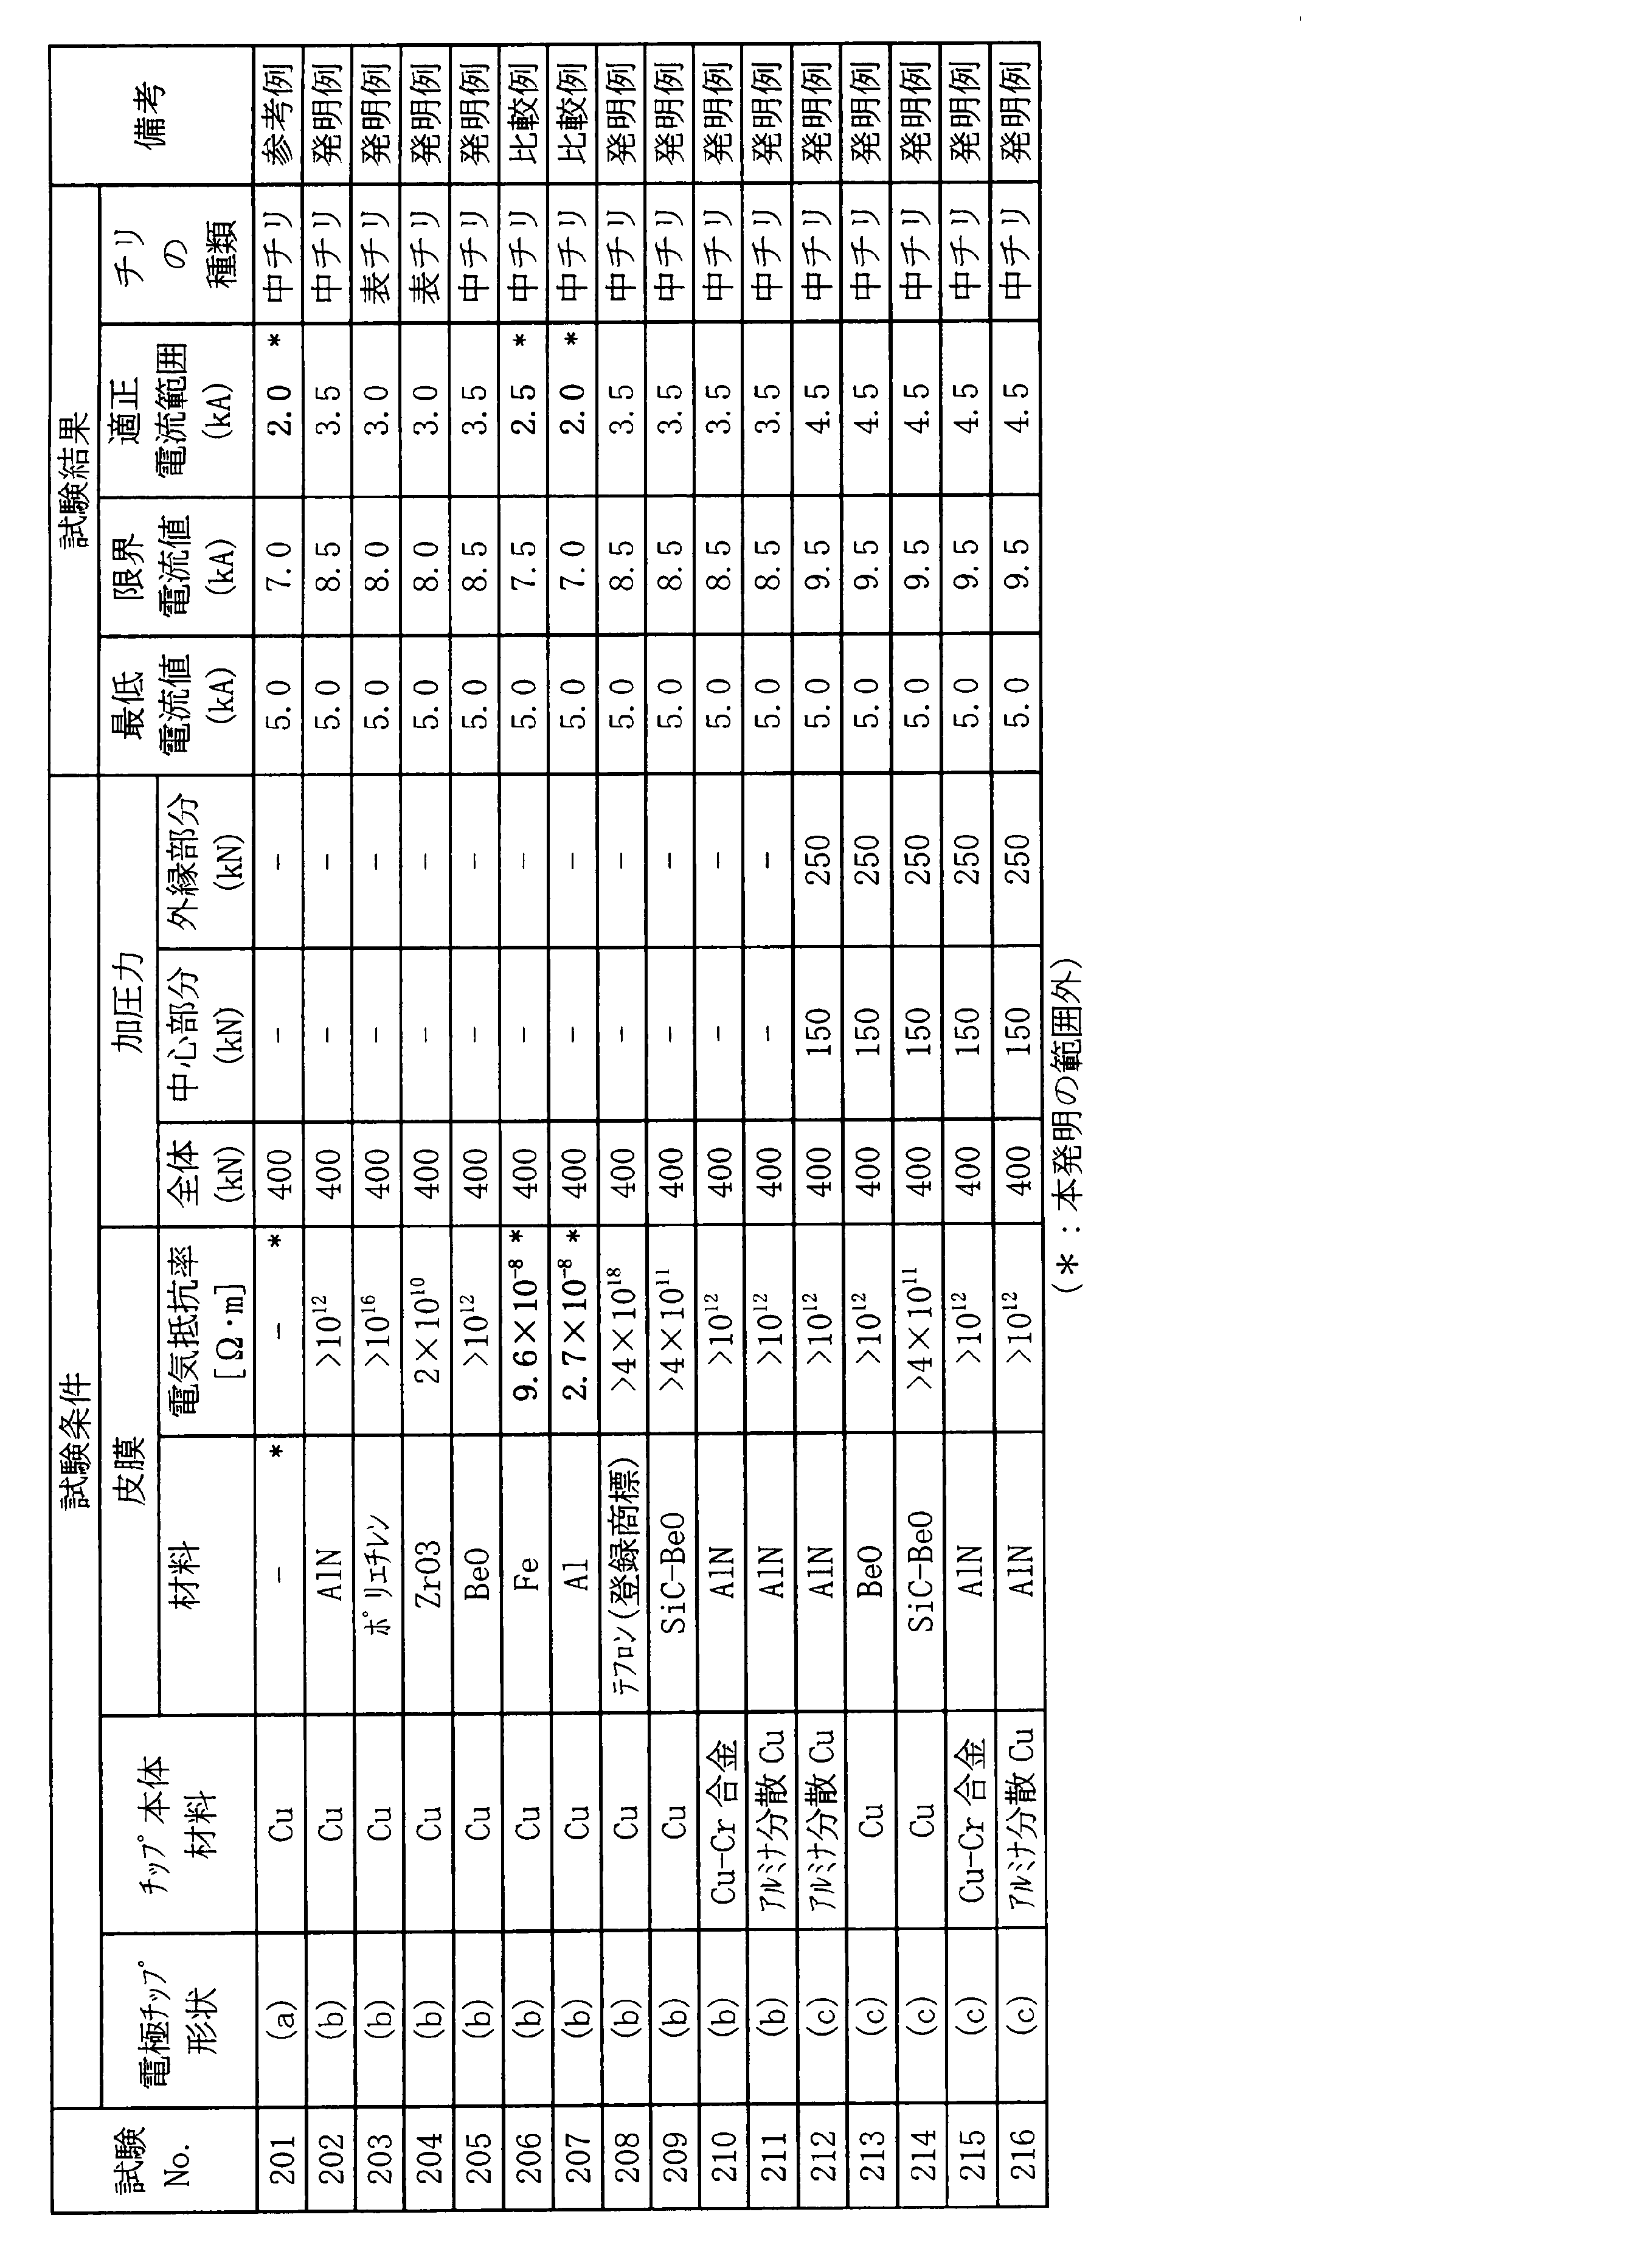 Wo2014010606a1 Spot Welding Electrode Chip Google Patents Lobe Diagram Figure Jpoxmldoc01 Appb T000003